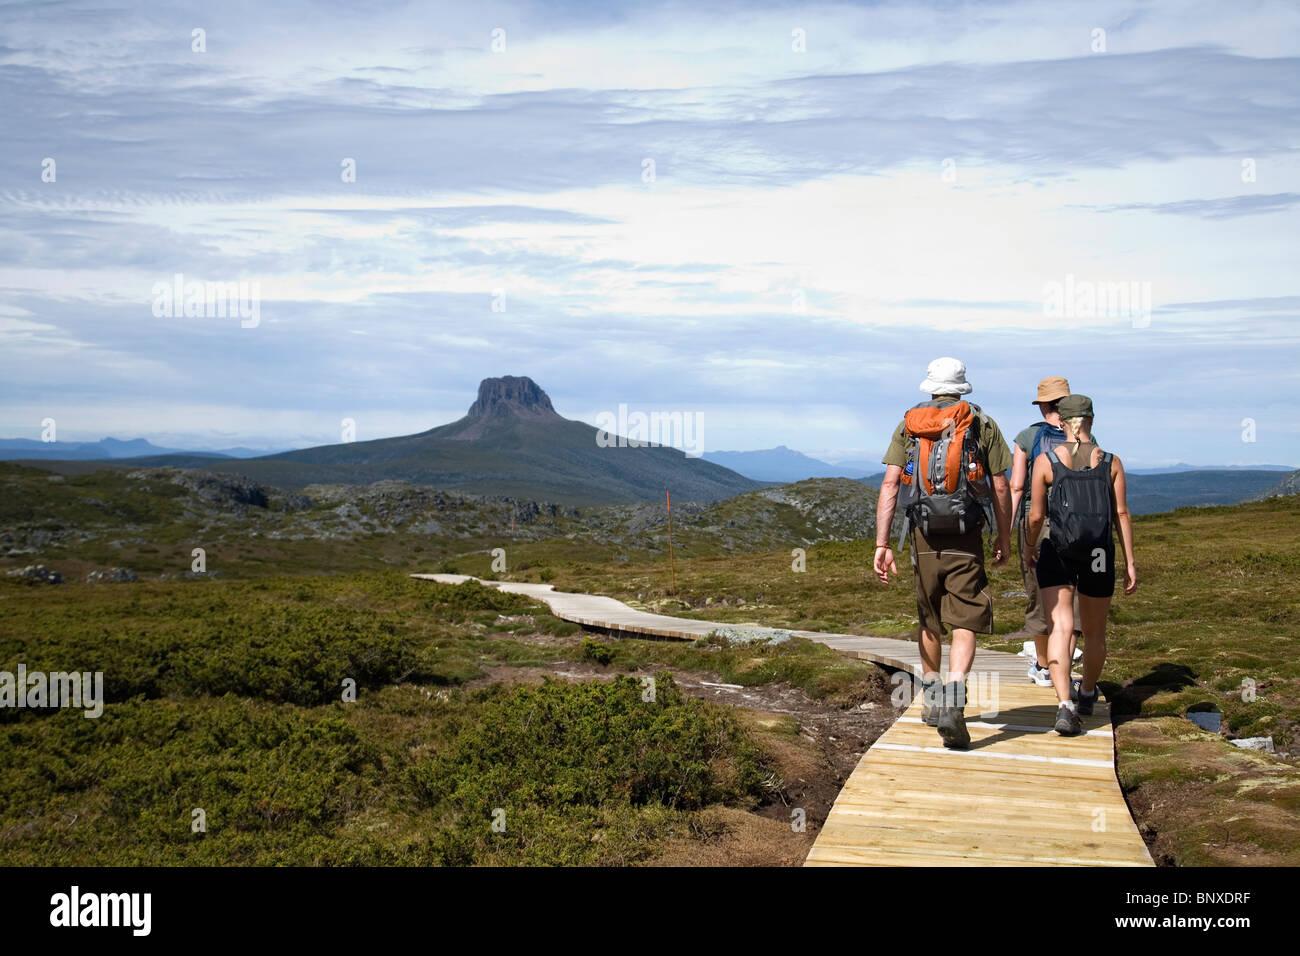 Hikers on the Overland Track on the Cradle Plateau.  Cradle Mountain-Lake St Clair National Park, Tasmania, AUSTRALIA - Stock Image